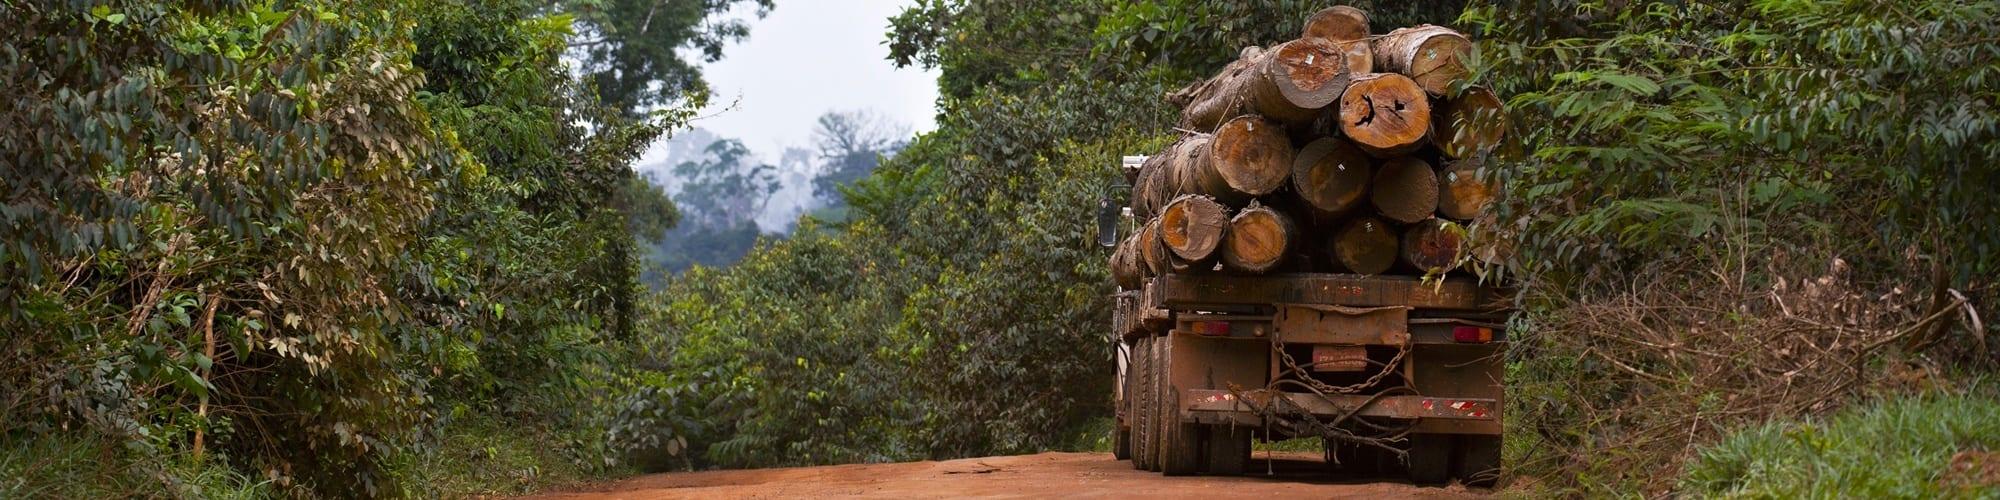 crimes ambientais - Crimes Ambientais